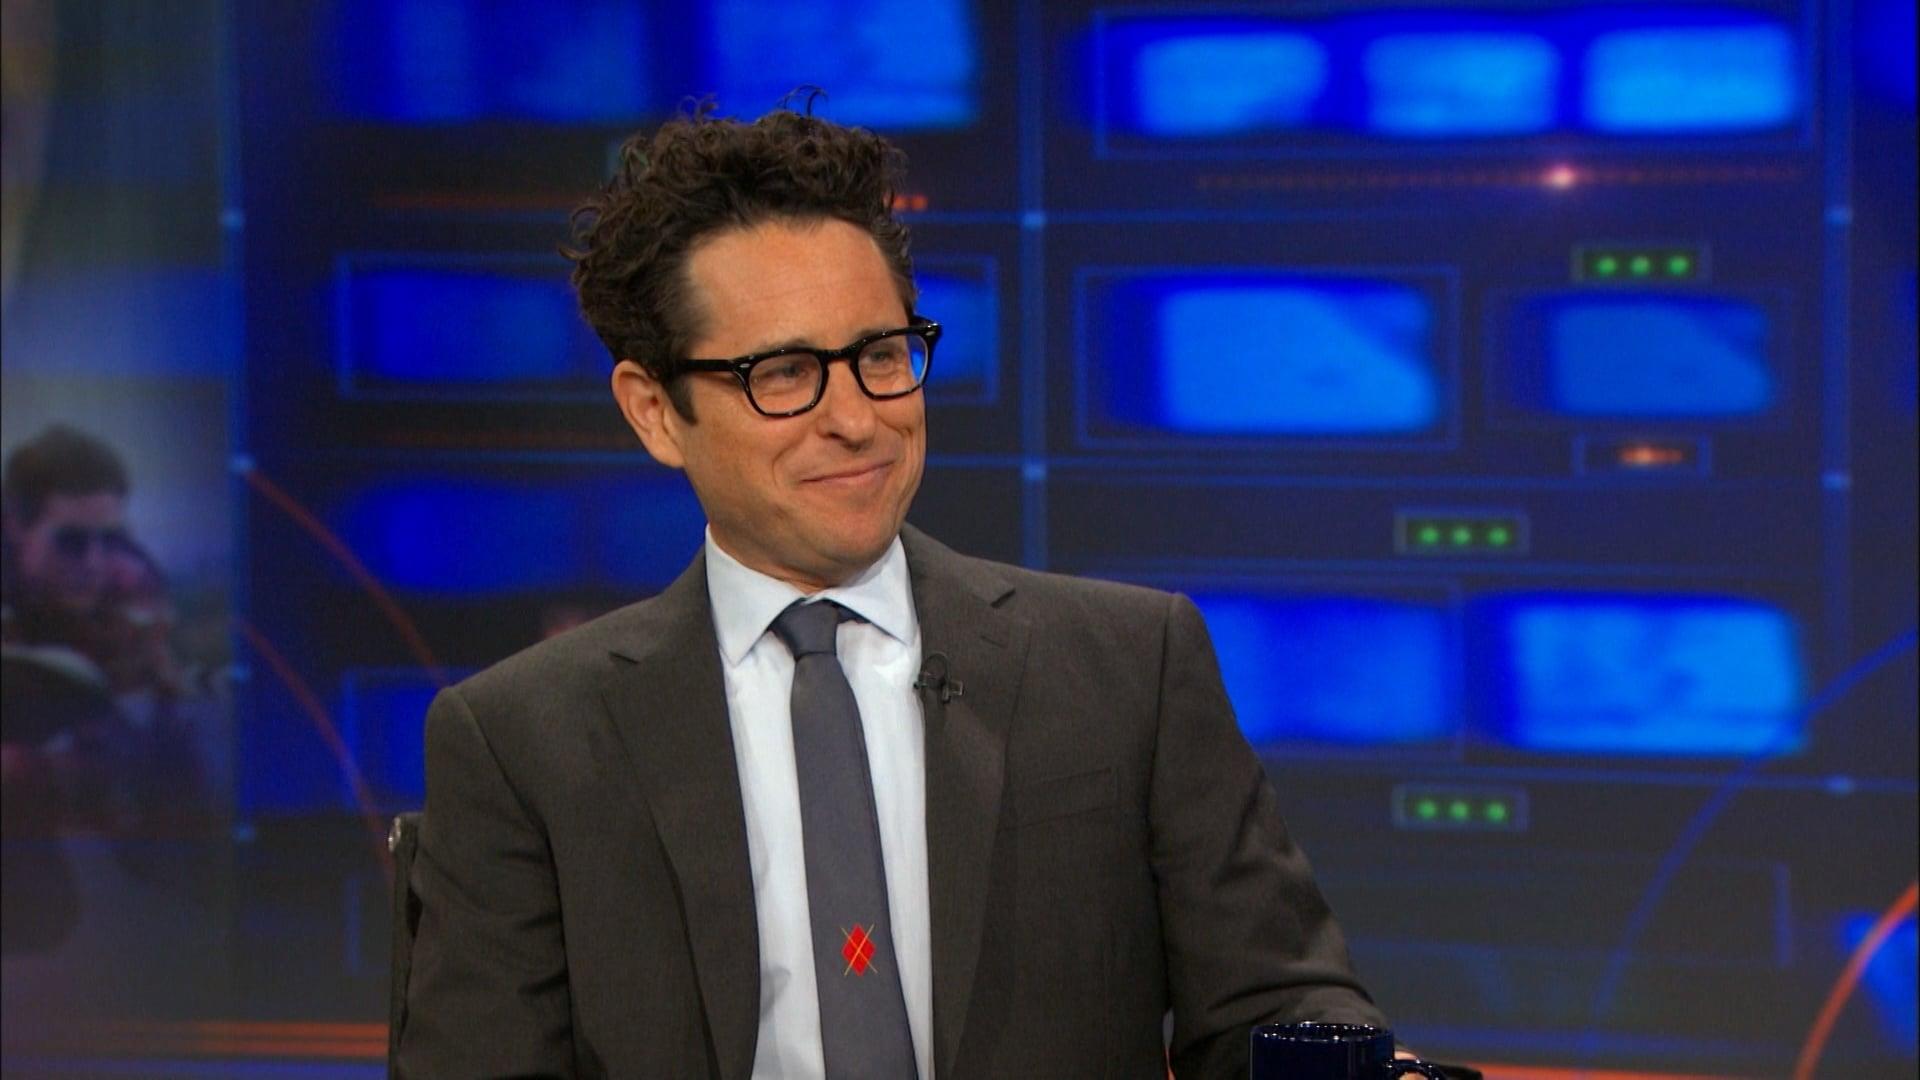 The Daily Show with Trevor Noah Season 20 :Episode 138  J.J. Abrams